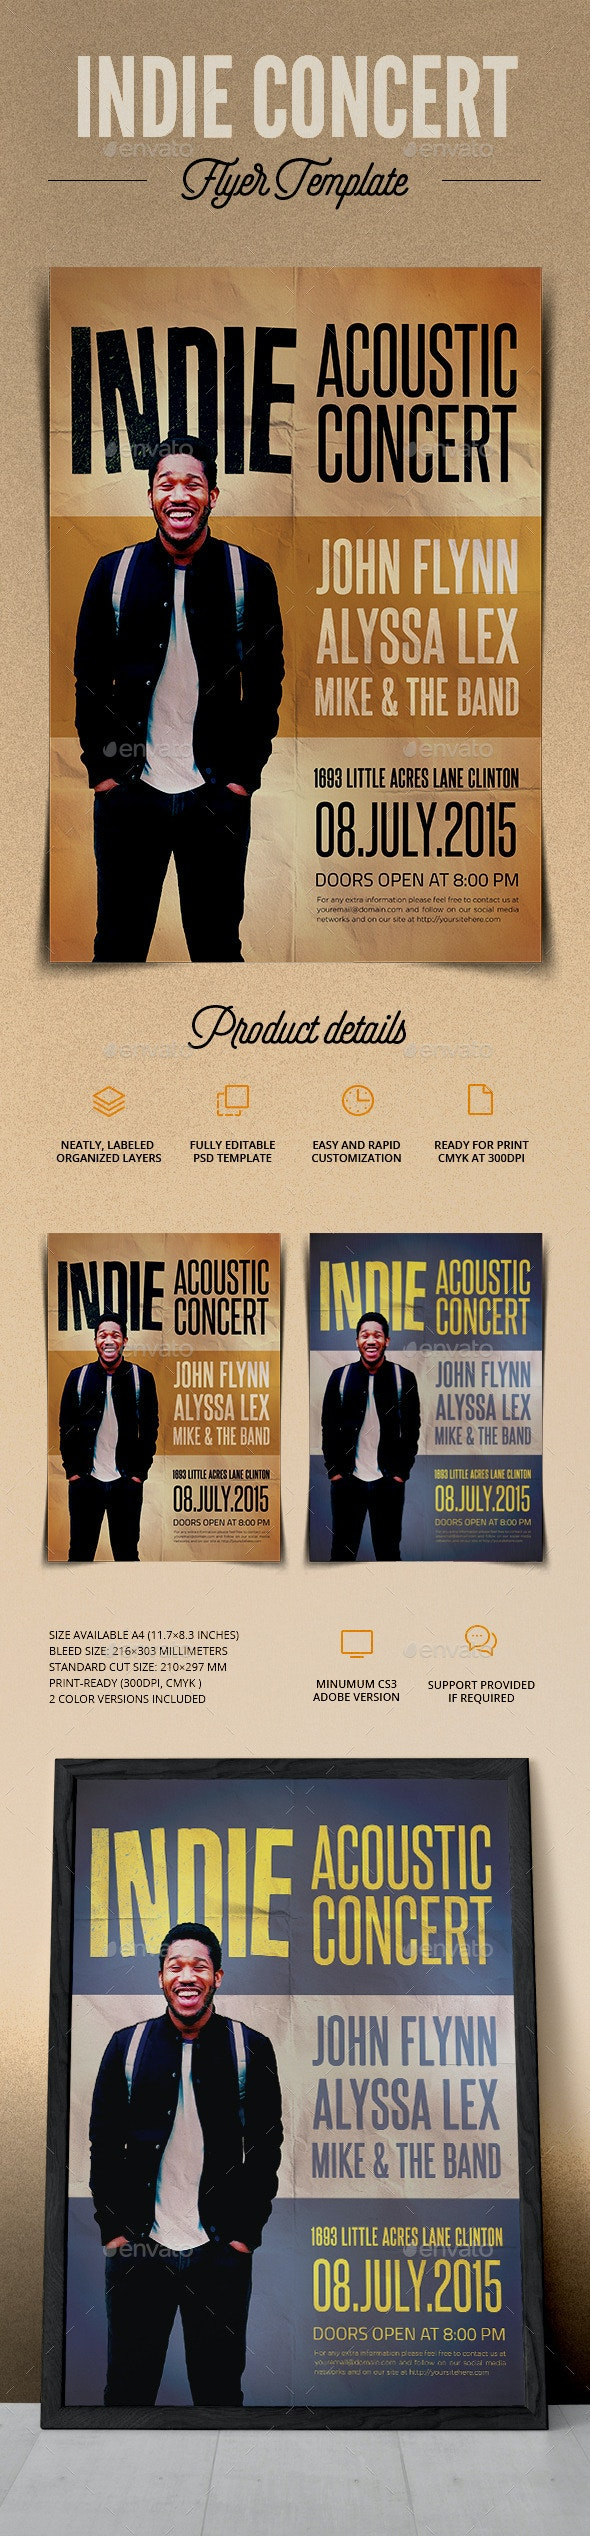 Indie Acoustic Concert Flyer  - Flyers Print Templates